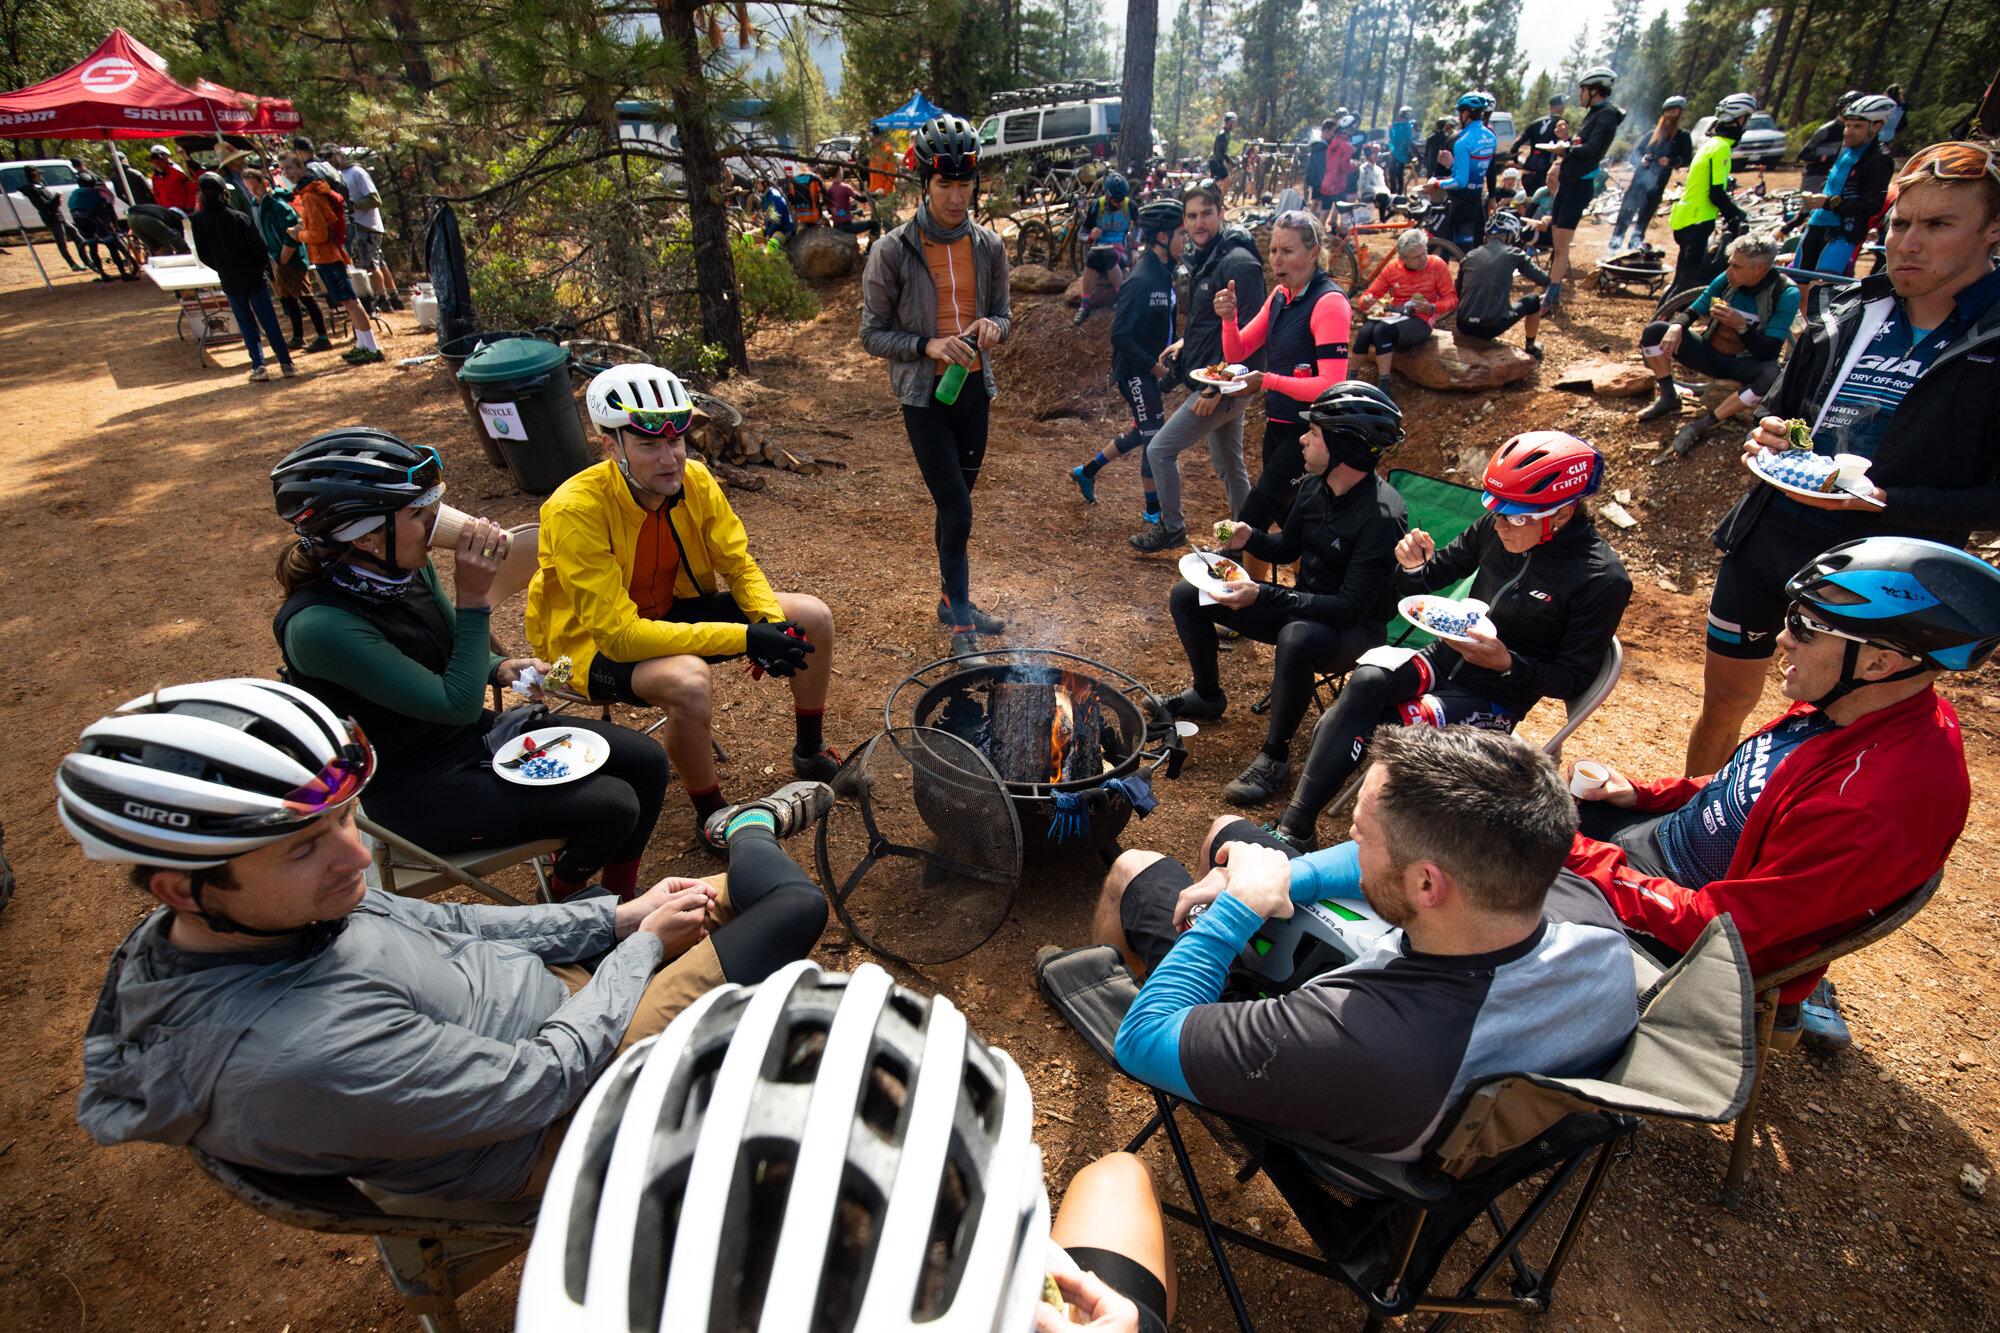 Cyclists Campfire California Gravel Bike Race